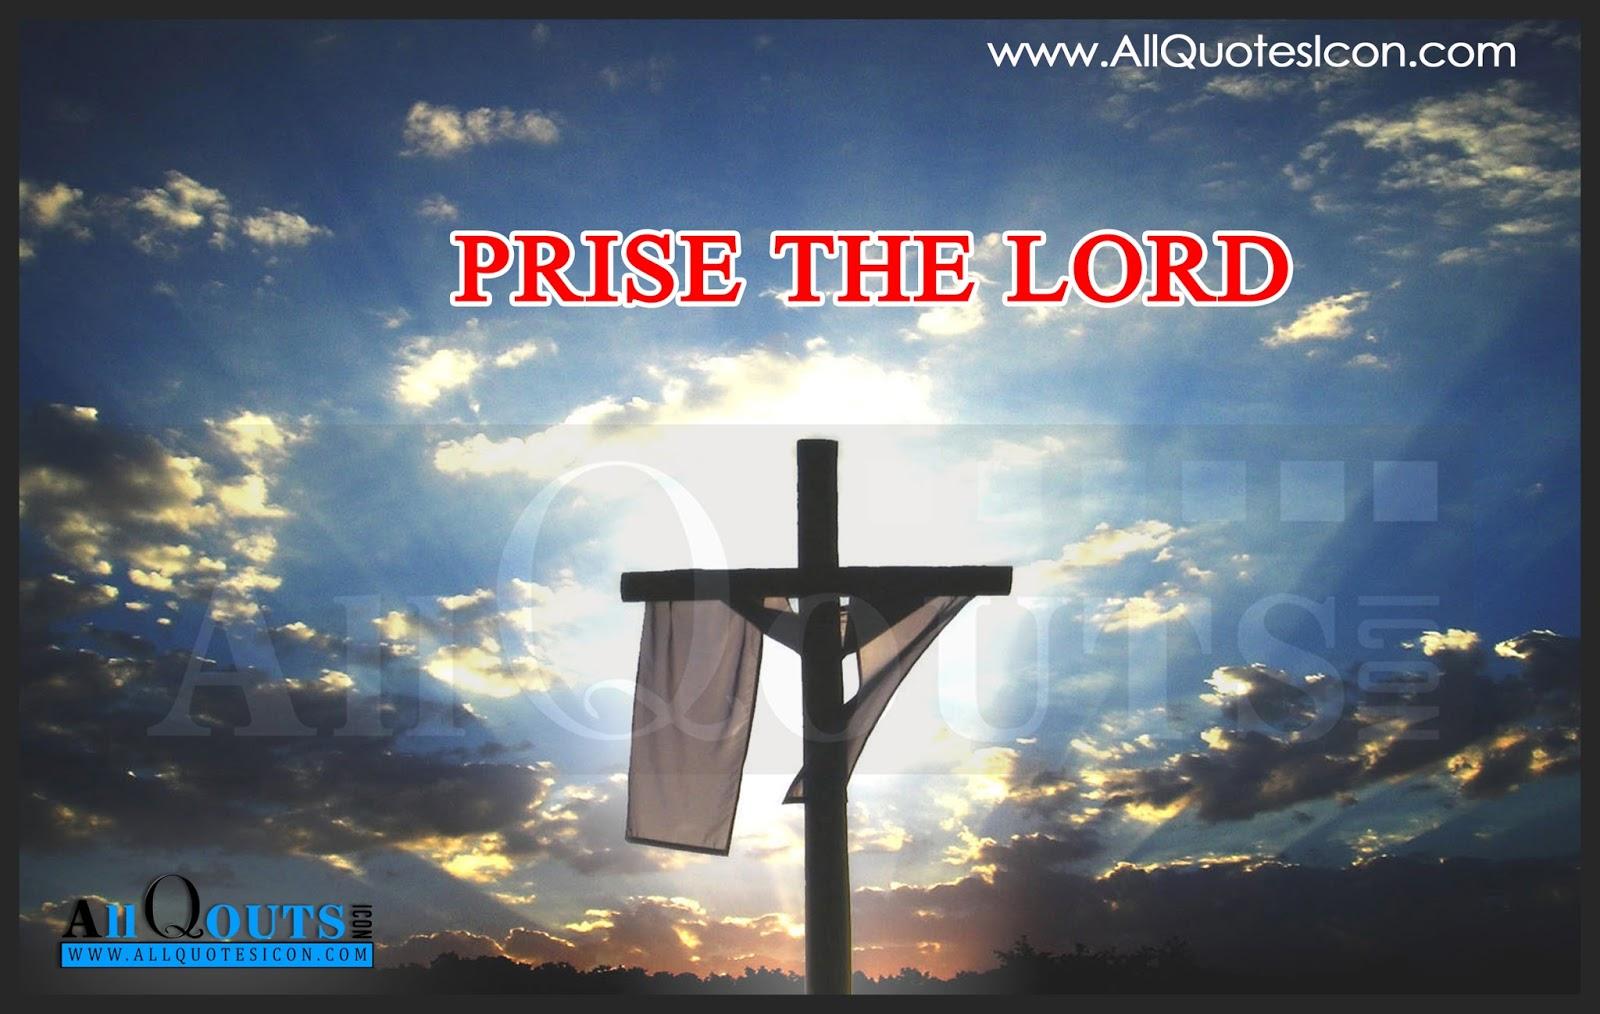 Amazing Wallpaper Lord English - Bible%2BQuotes%2Bin%2BEnglish%2B9  Image_1001865.JPG